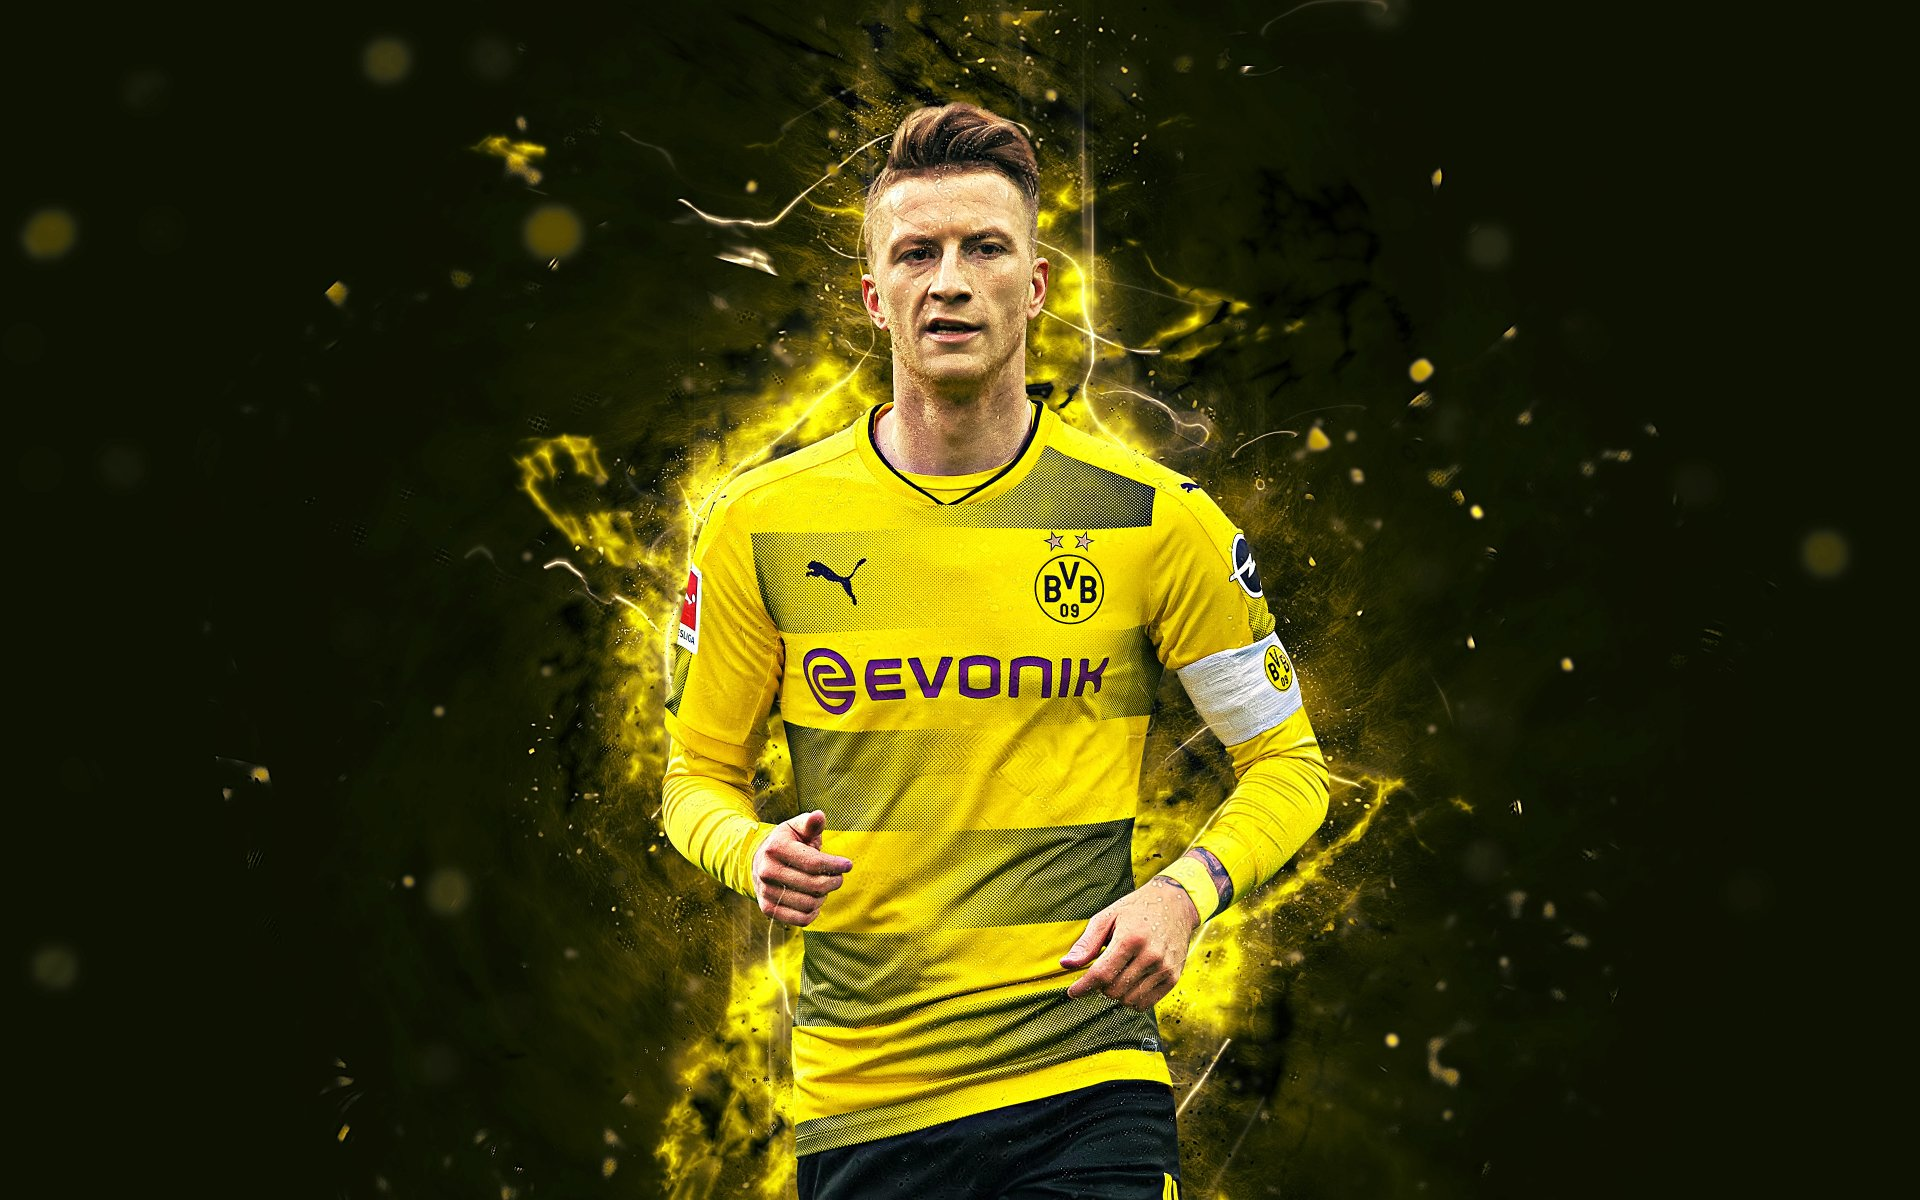 yellow dress Marco Reus Wallpaper